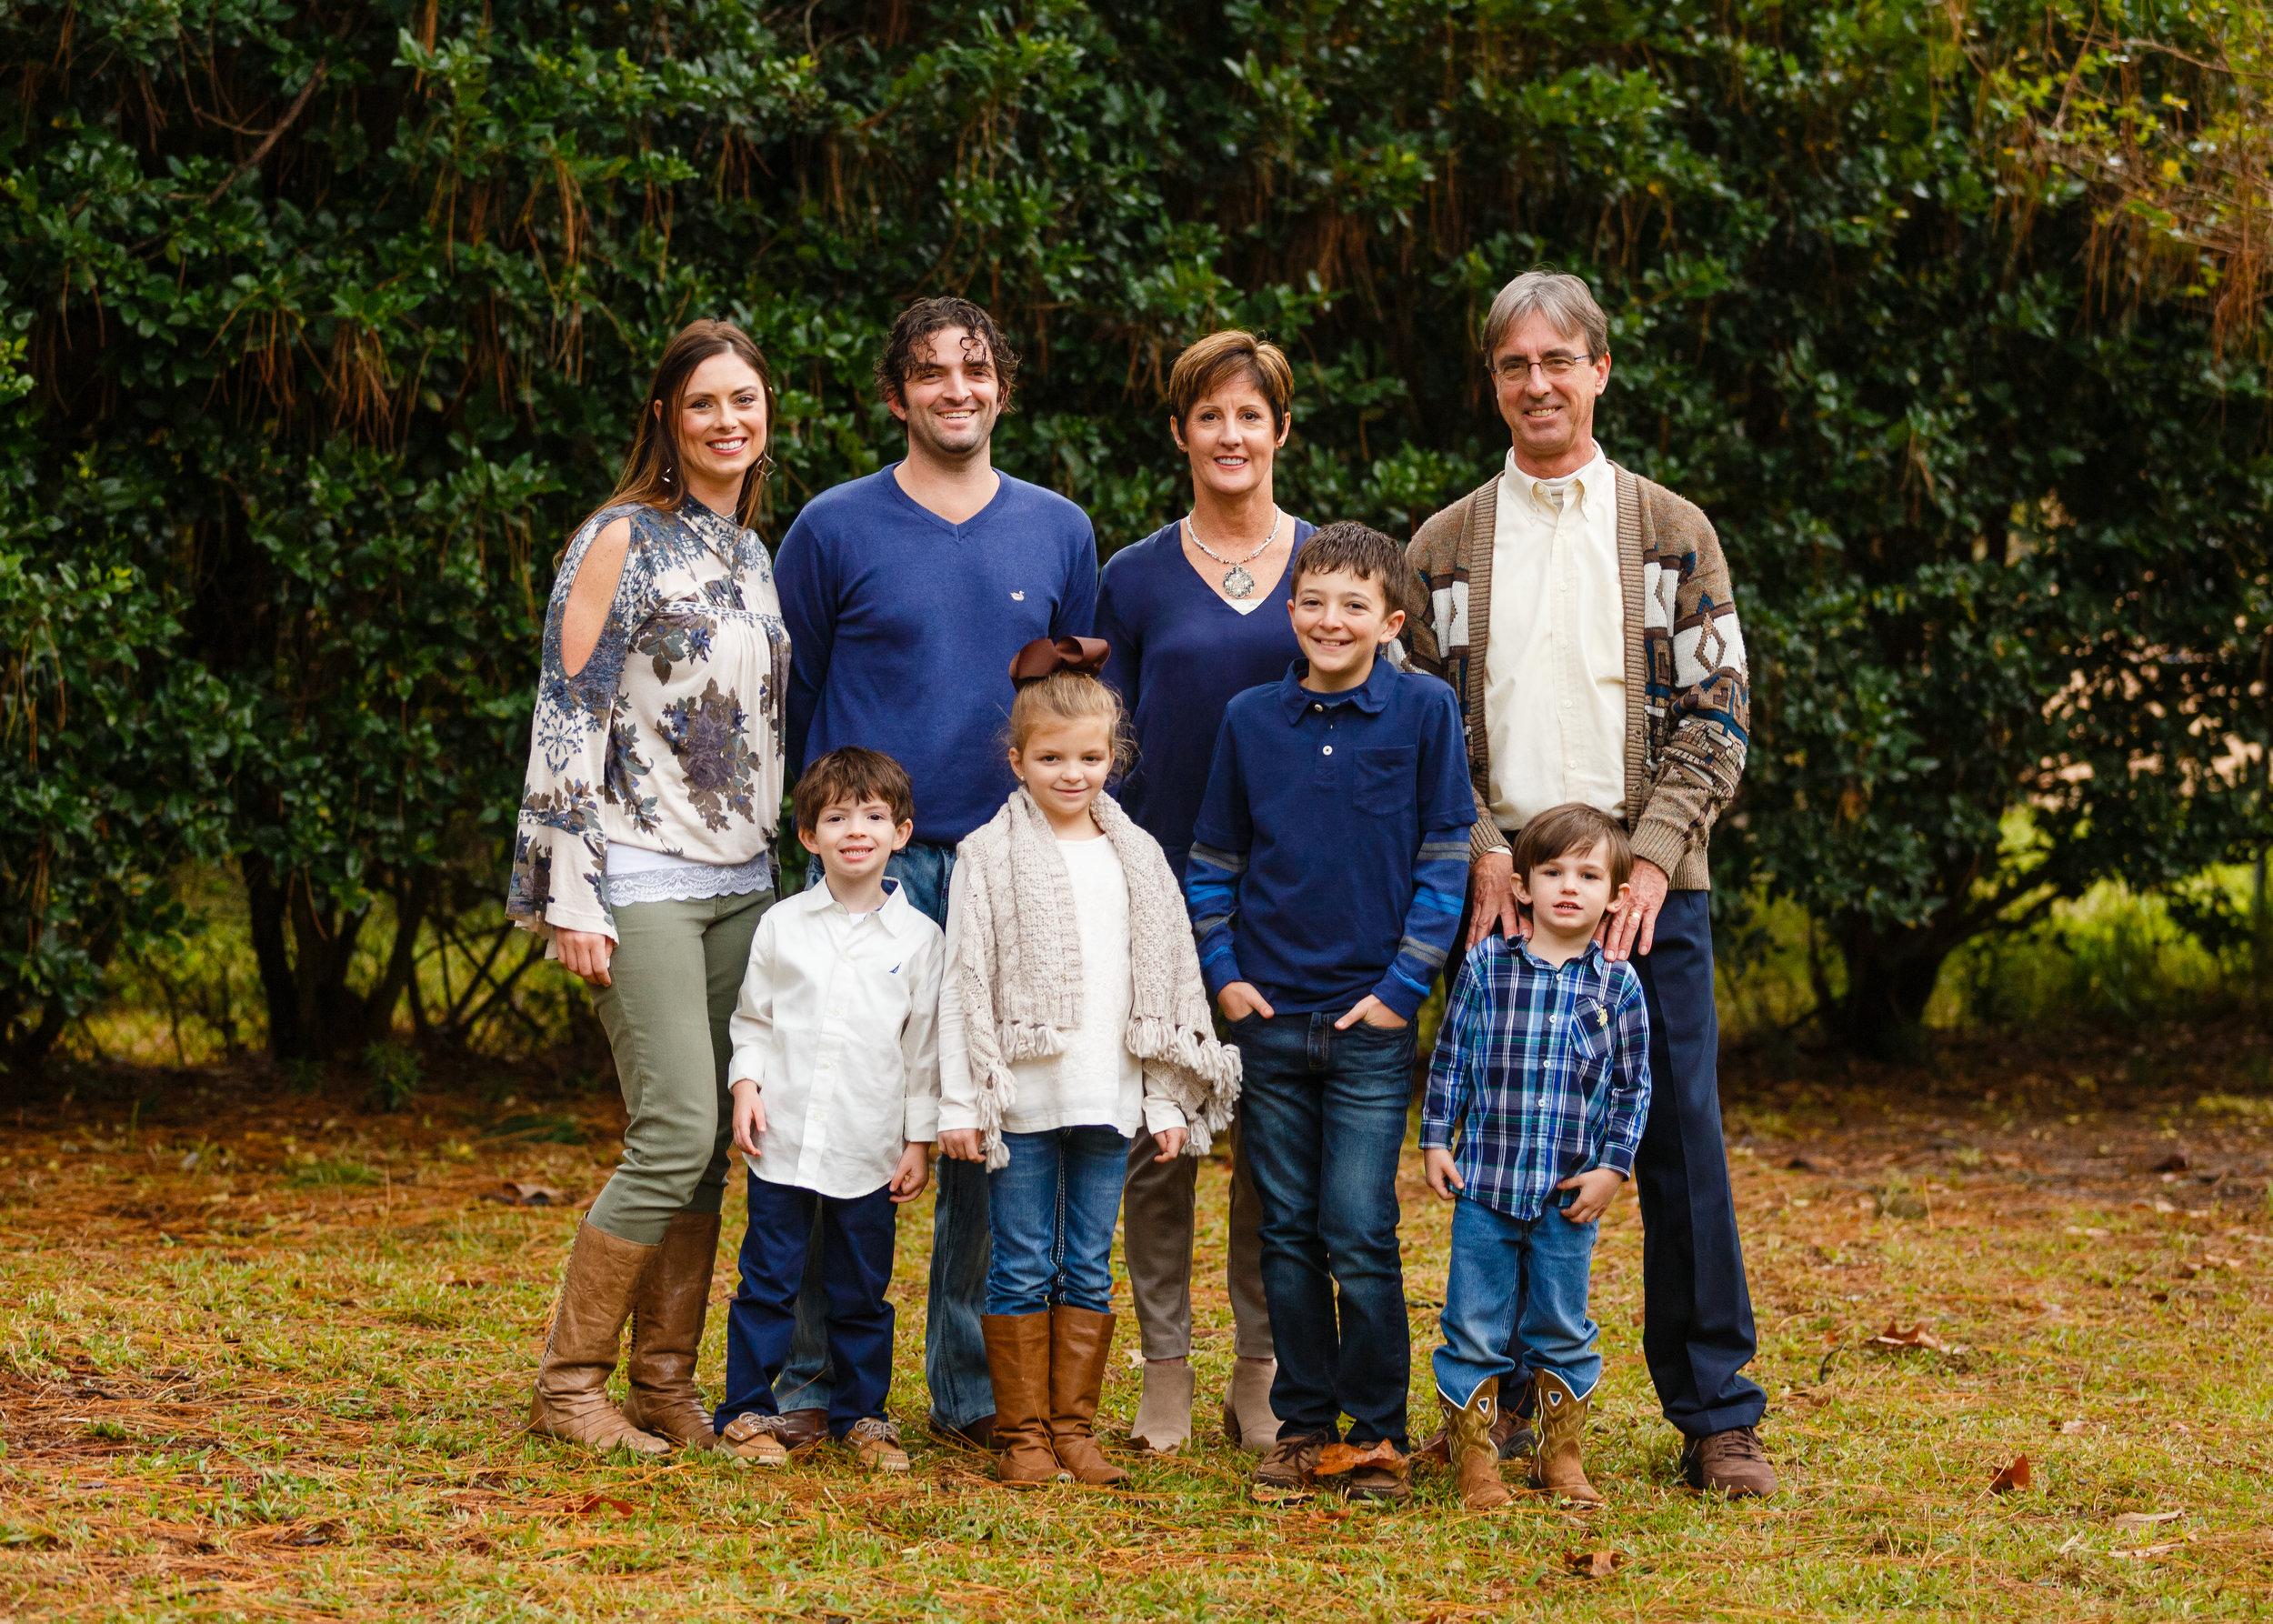 Family-child-portrait-lafayette-broussard-youngsville-photographer-1-2.jpg